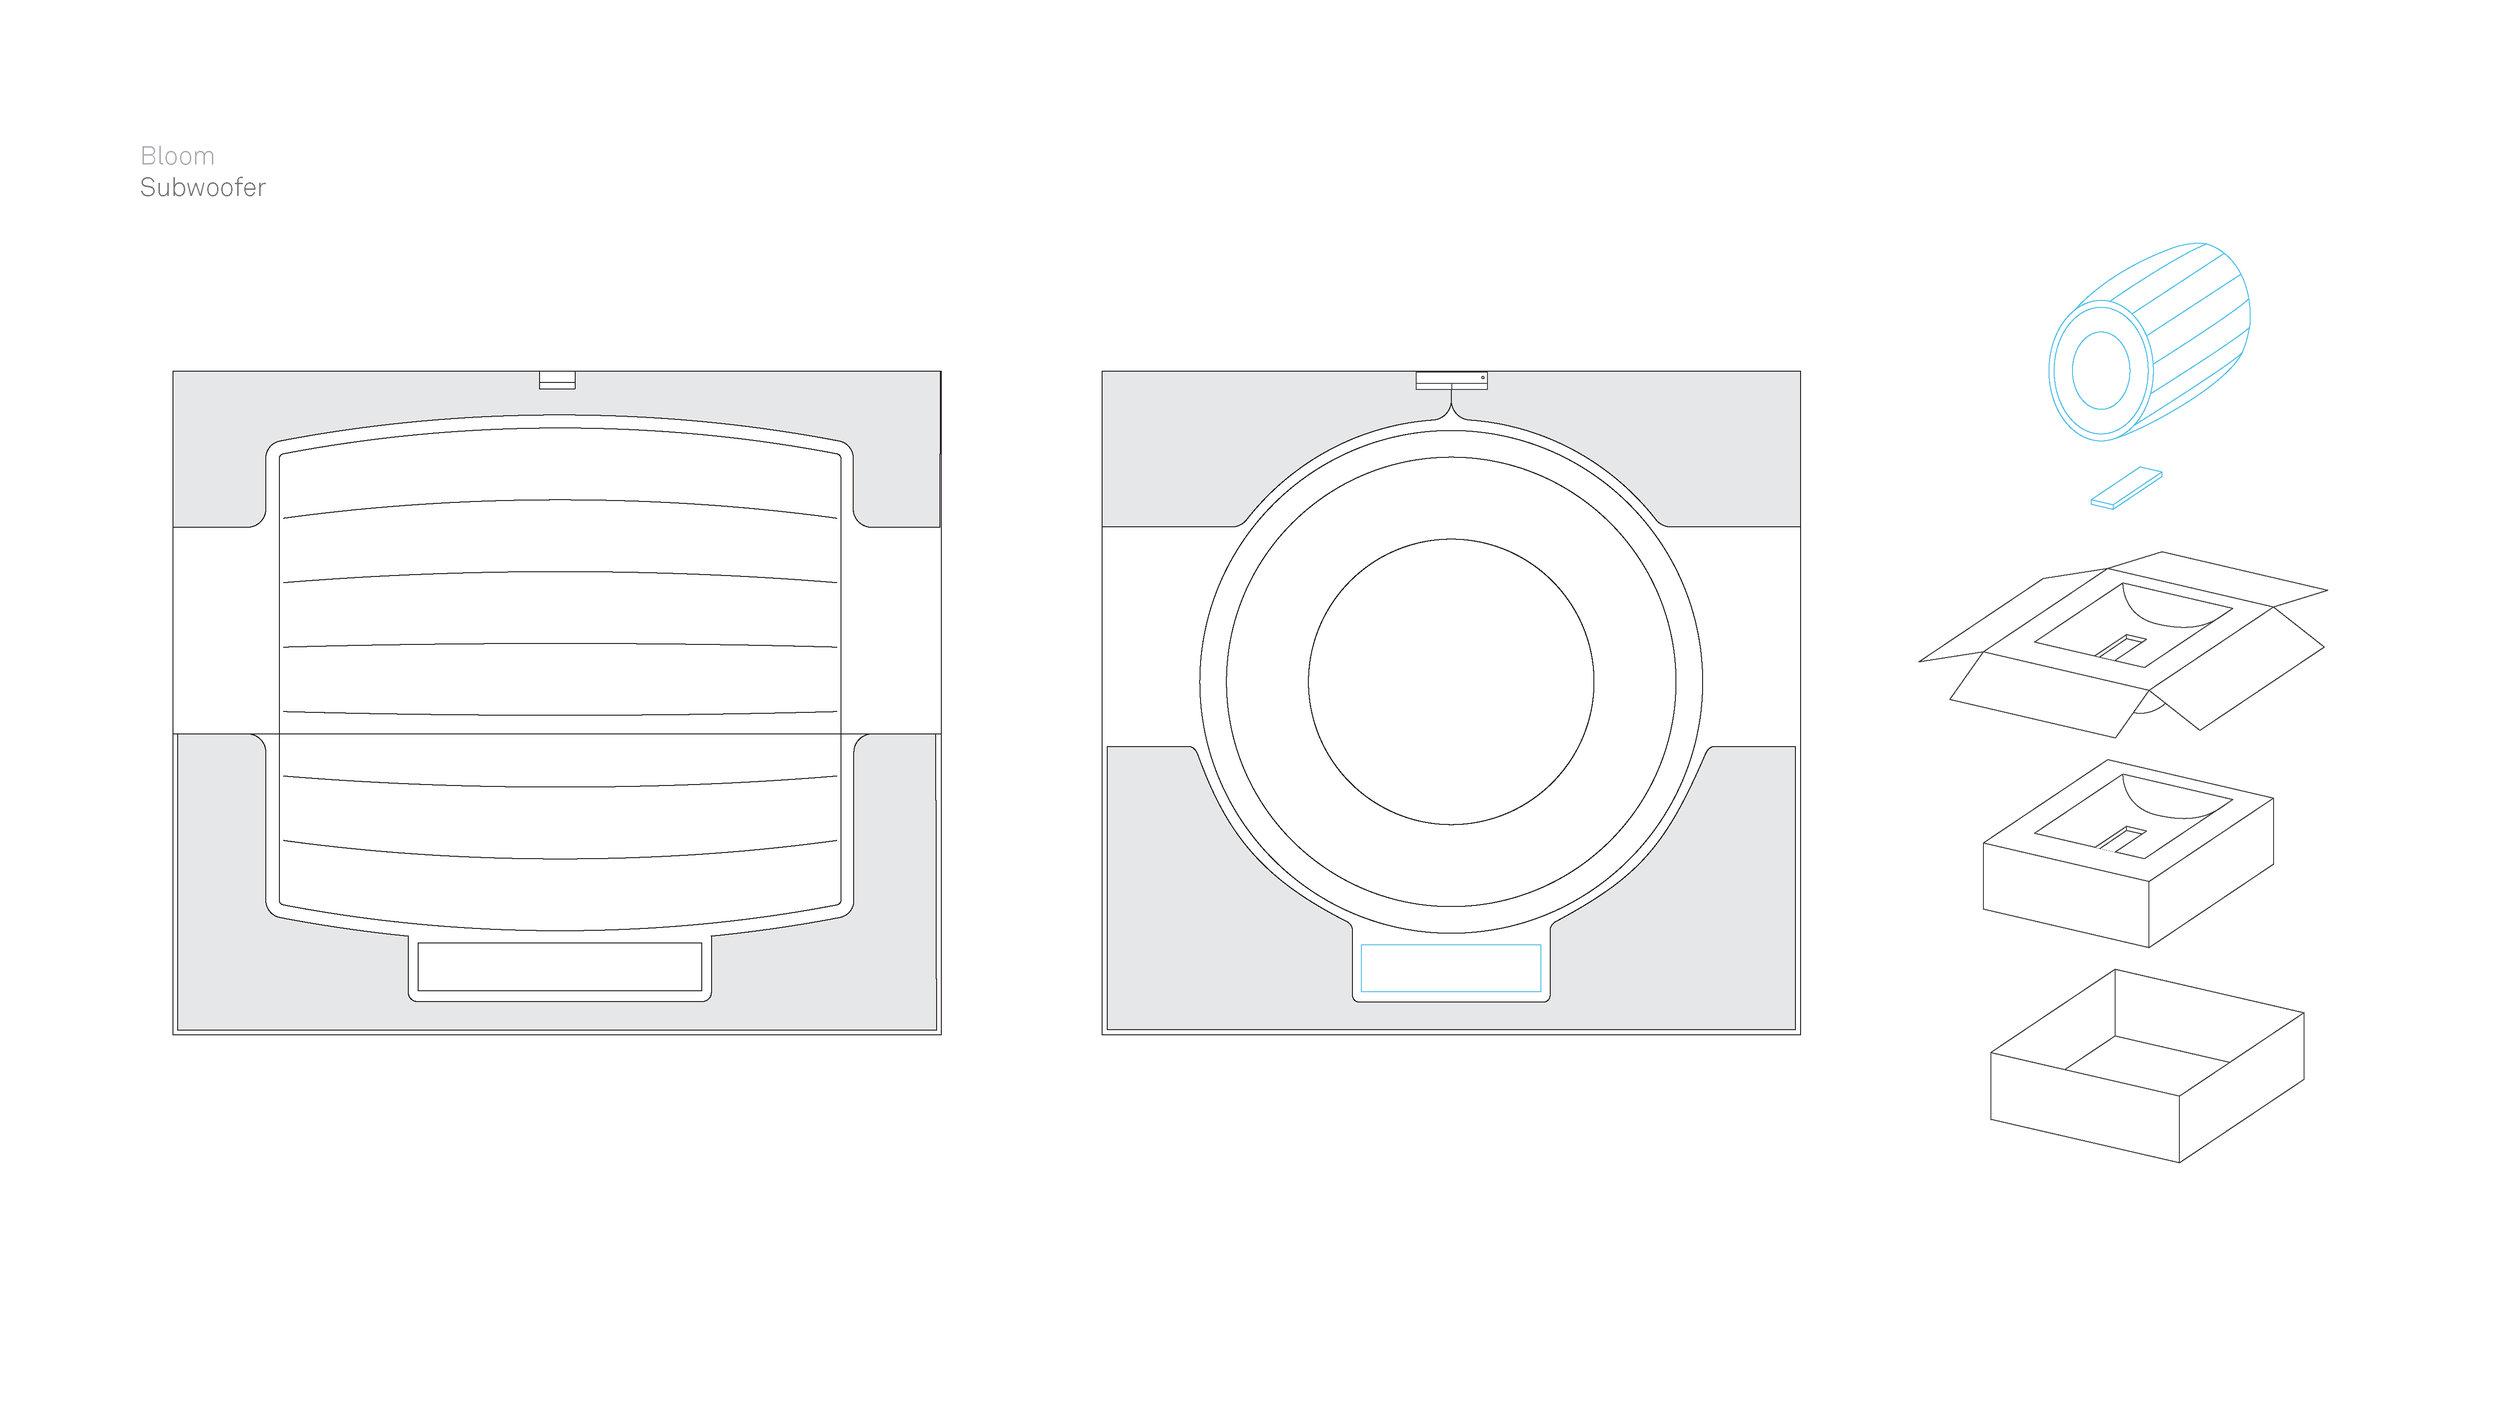 B&W_LibertySuite_PackagingStructure_R159.jpg